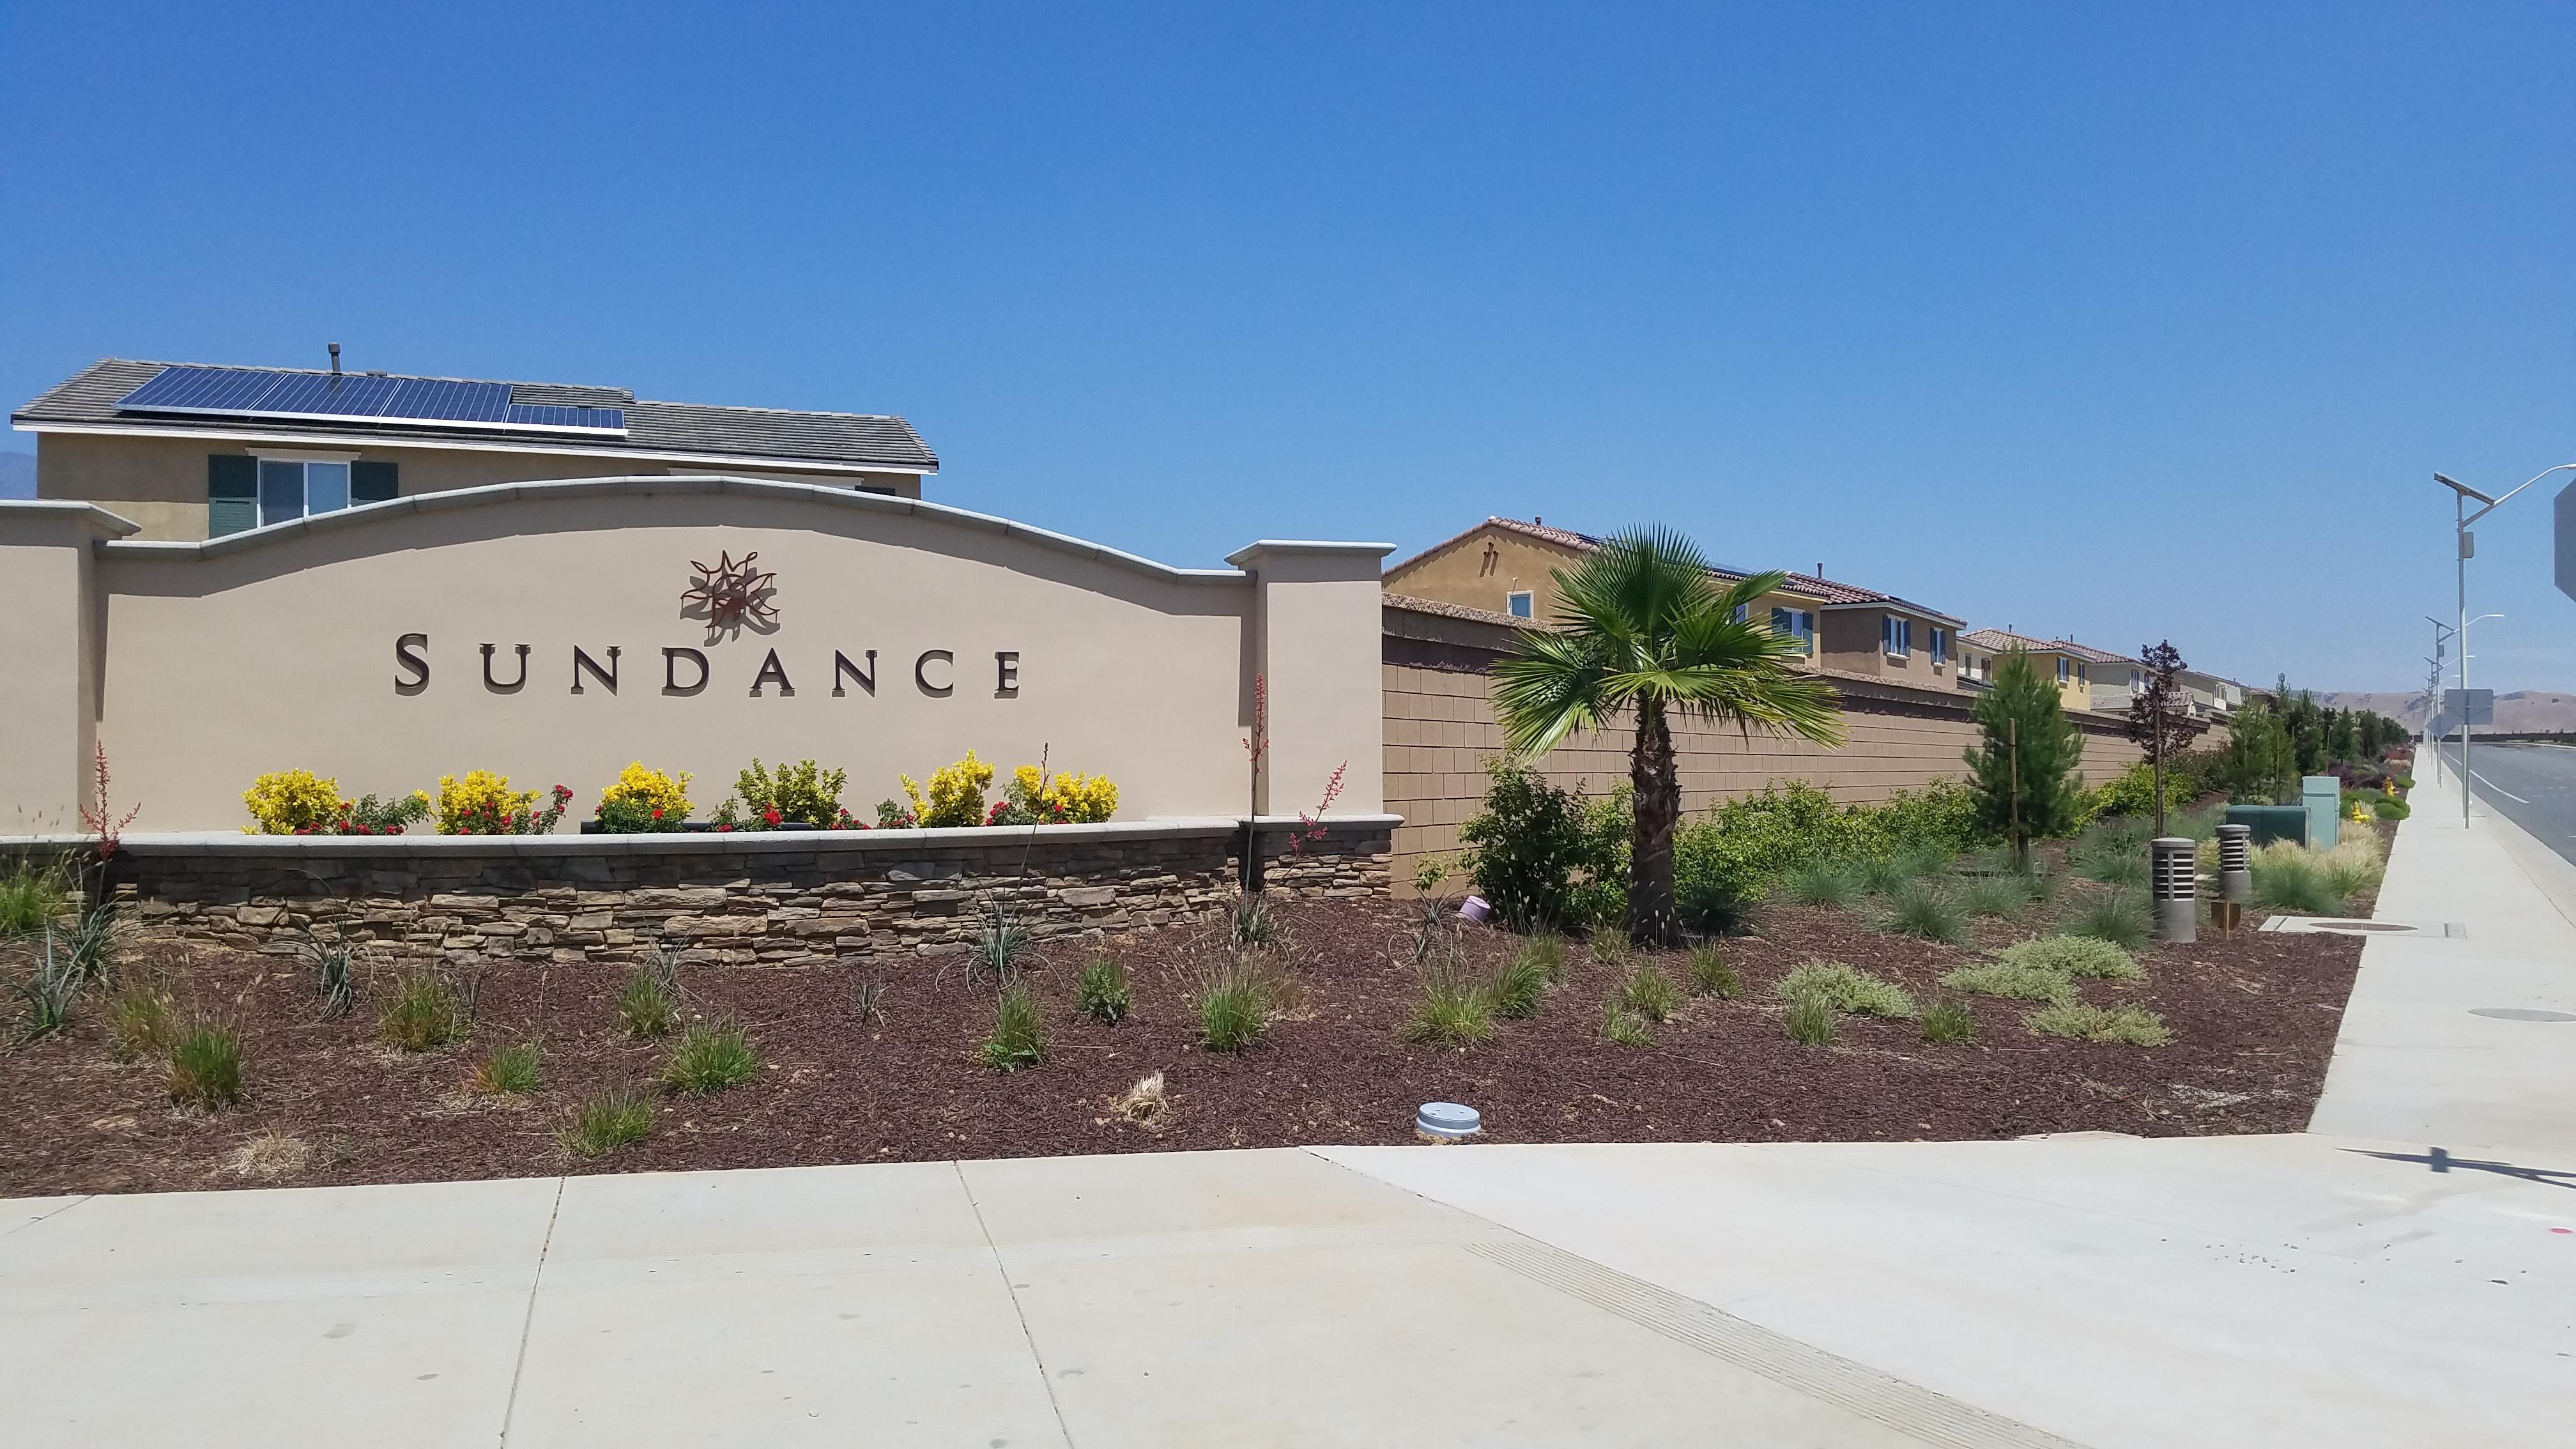 Sundance Community in Beaumont CA